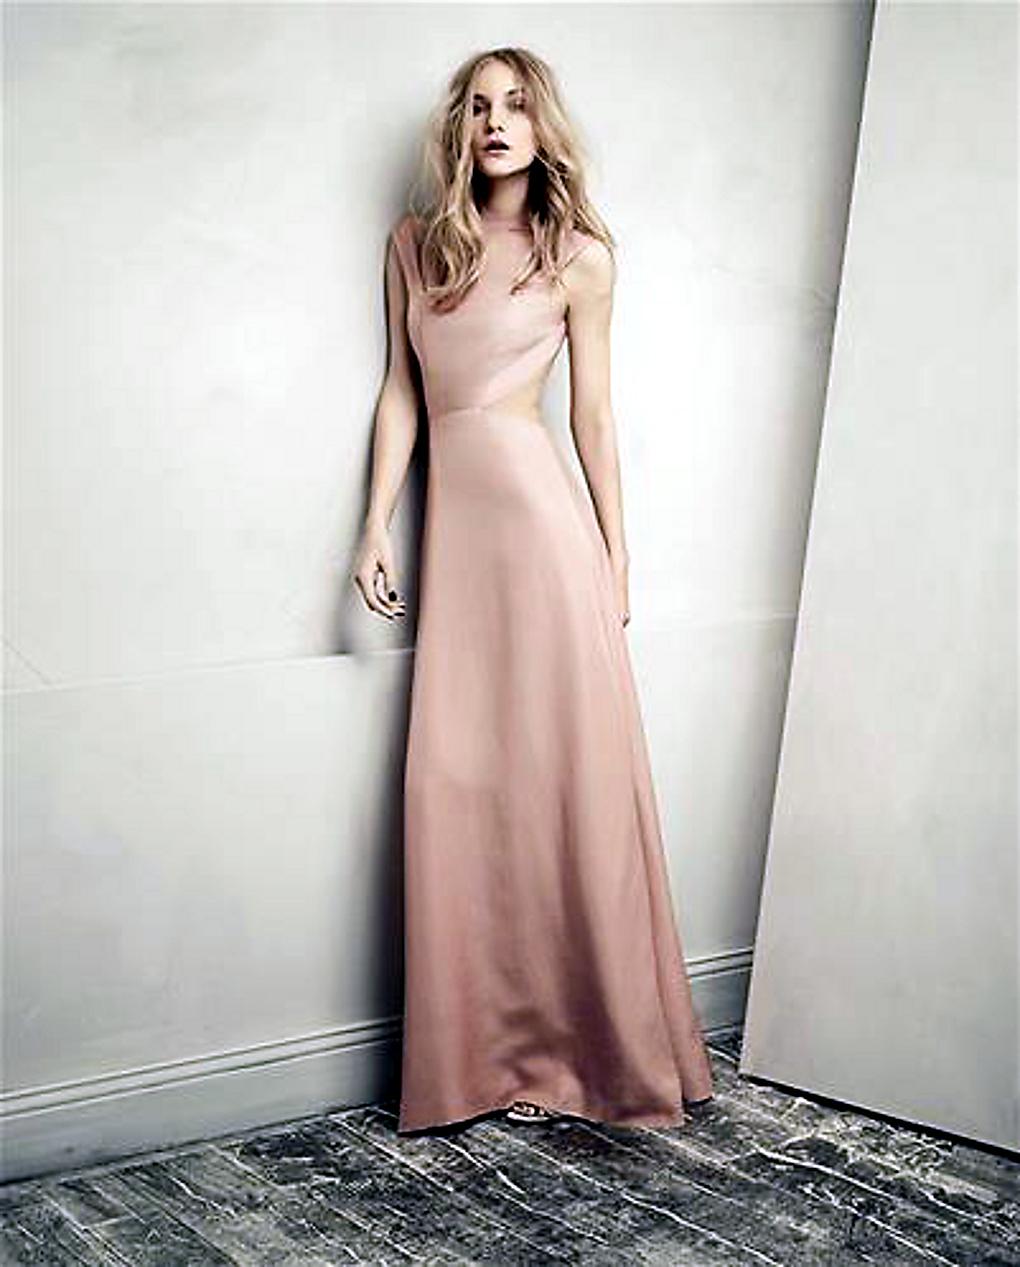 H&M macht auf Hollywood-Glamour | Gerrys Blog